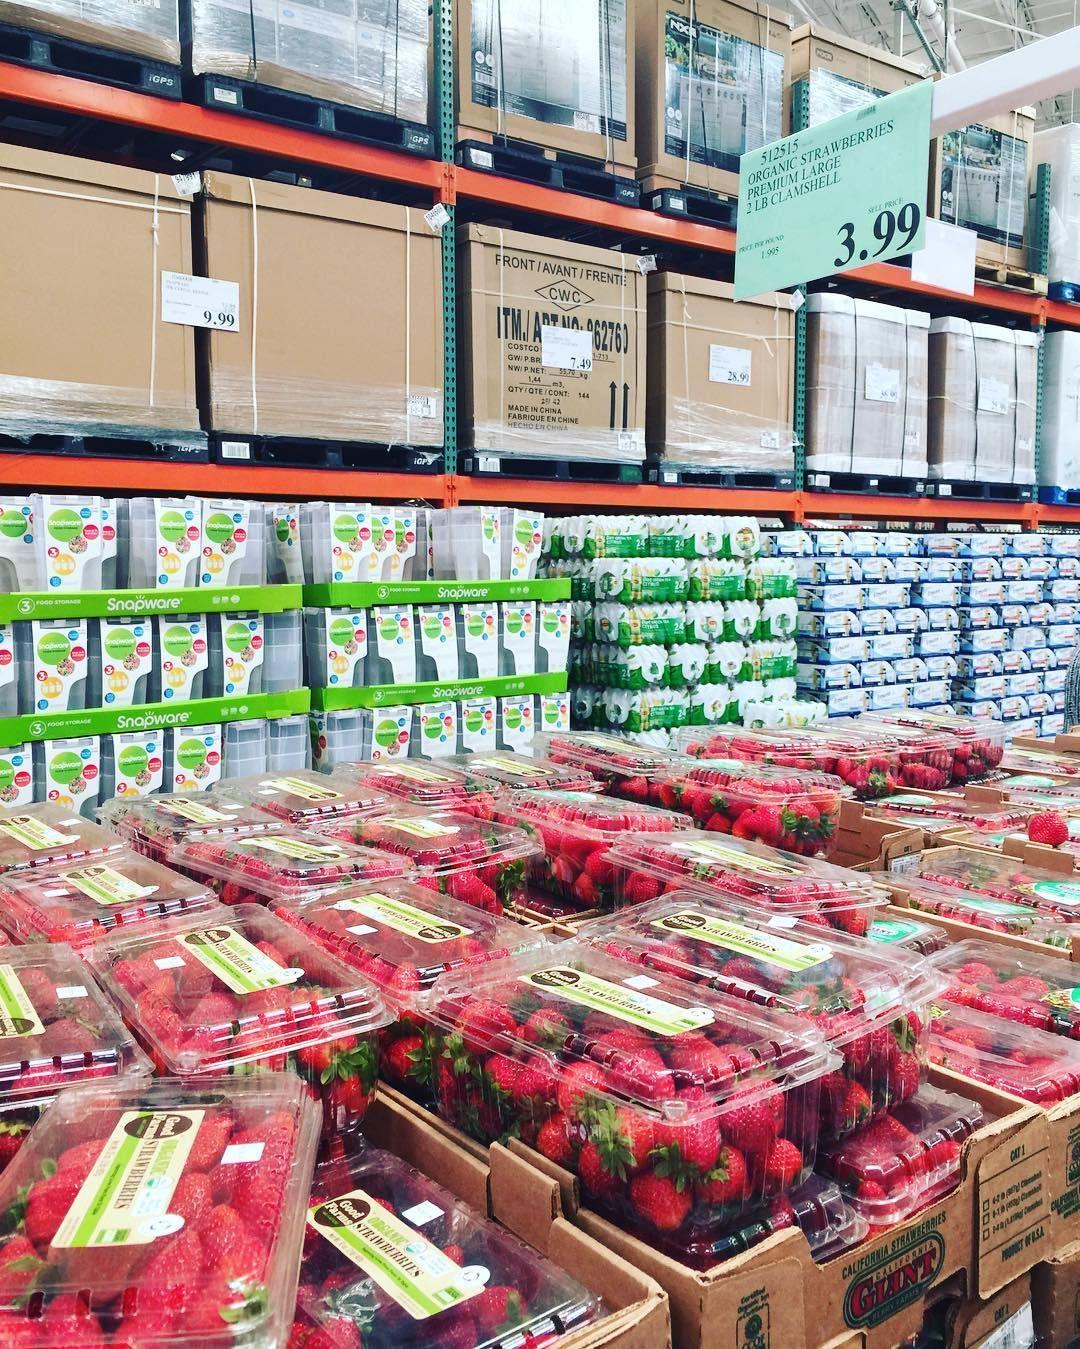 bb4b2331d9e Organic Strawberries $1.99 lb at #costco #organiccouponing #couponcommunity  #tomorrowsmom Costco, Strawberries